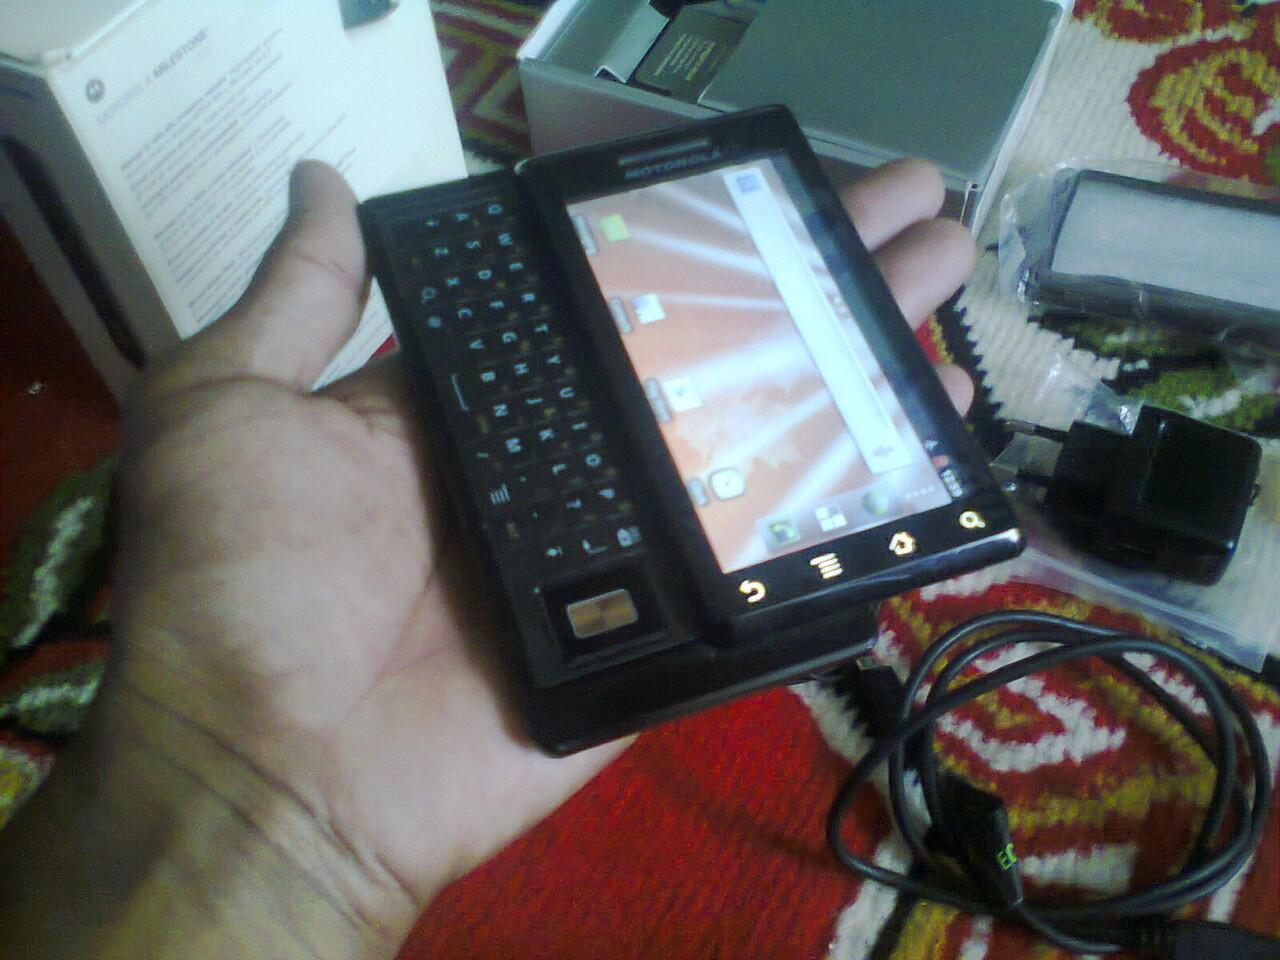 hp smartphone android motorola melestone ga kalah keren sama lenovo,bb,iphone,samsung